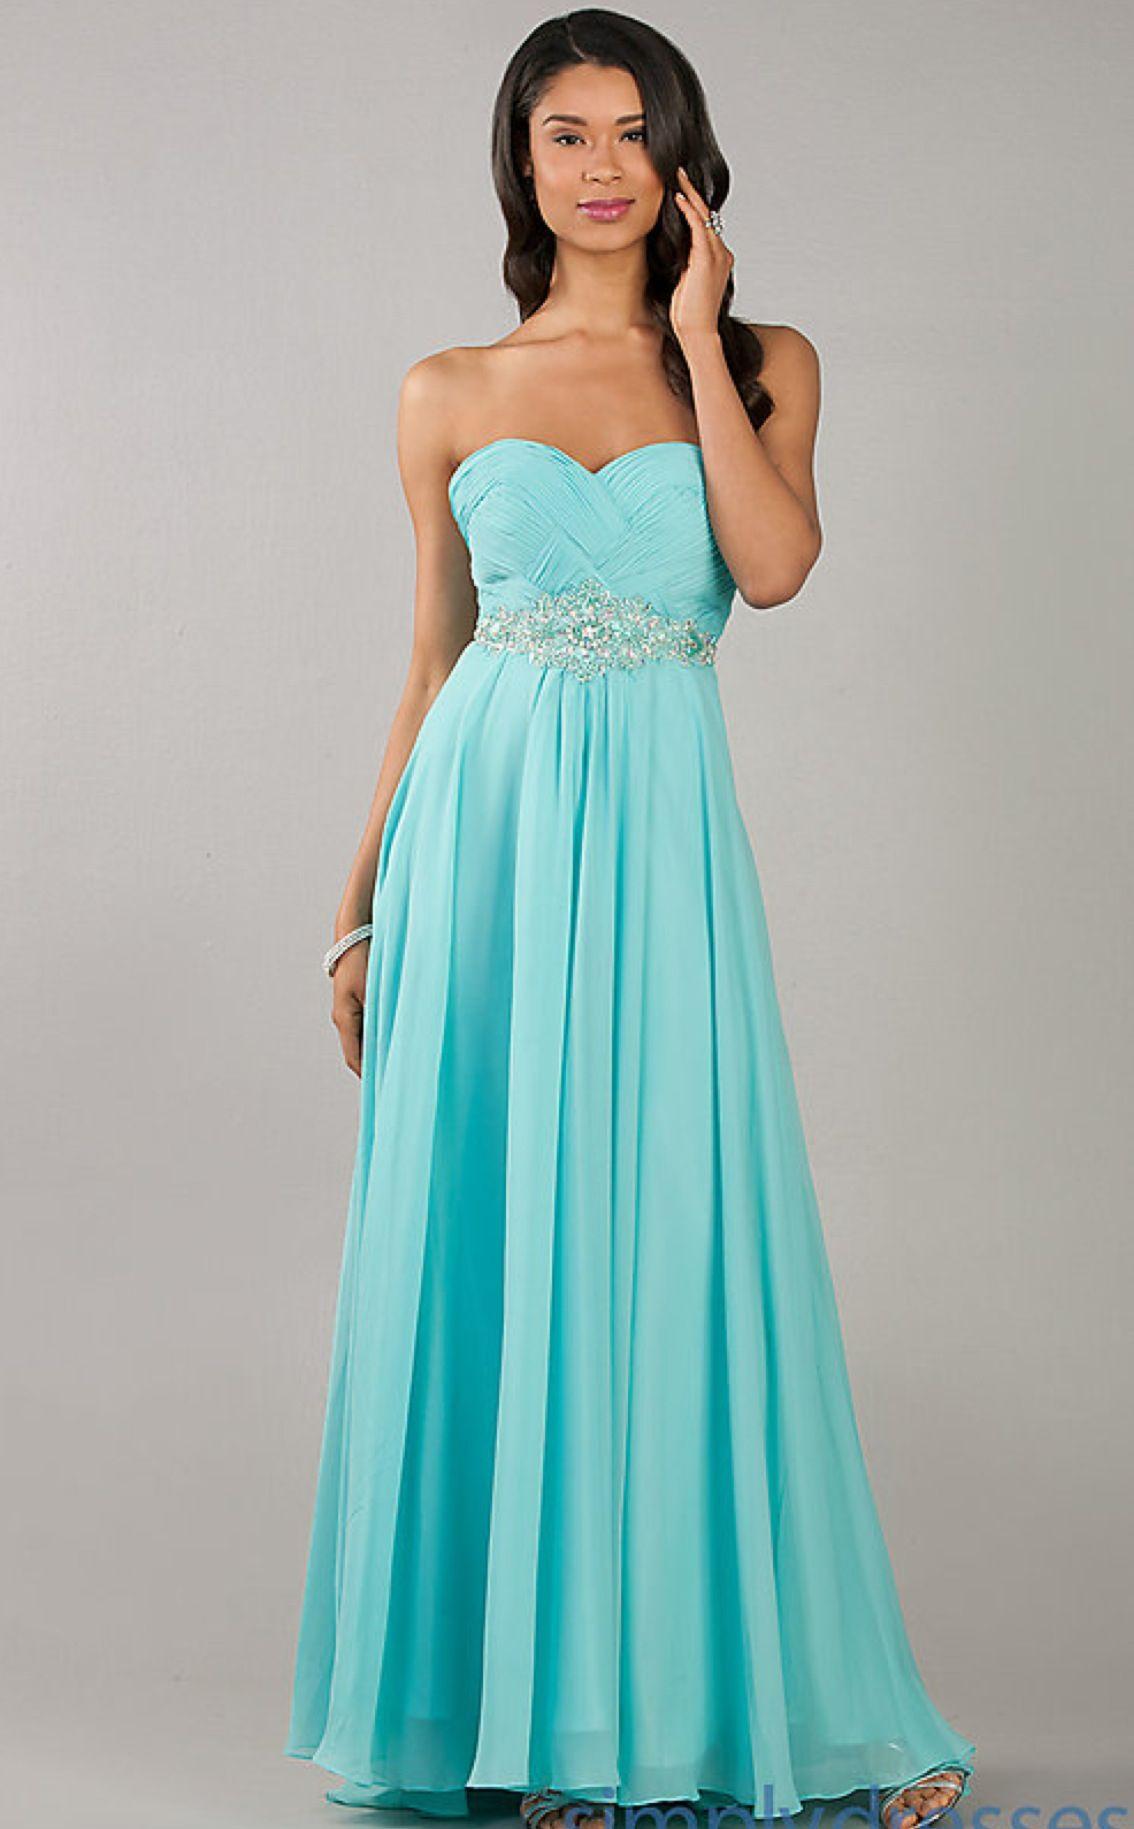 Tiffany Blue/Aqua dress | Things I love | Pinterest | Tiffany blue ...